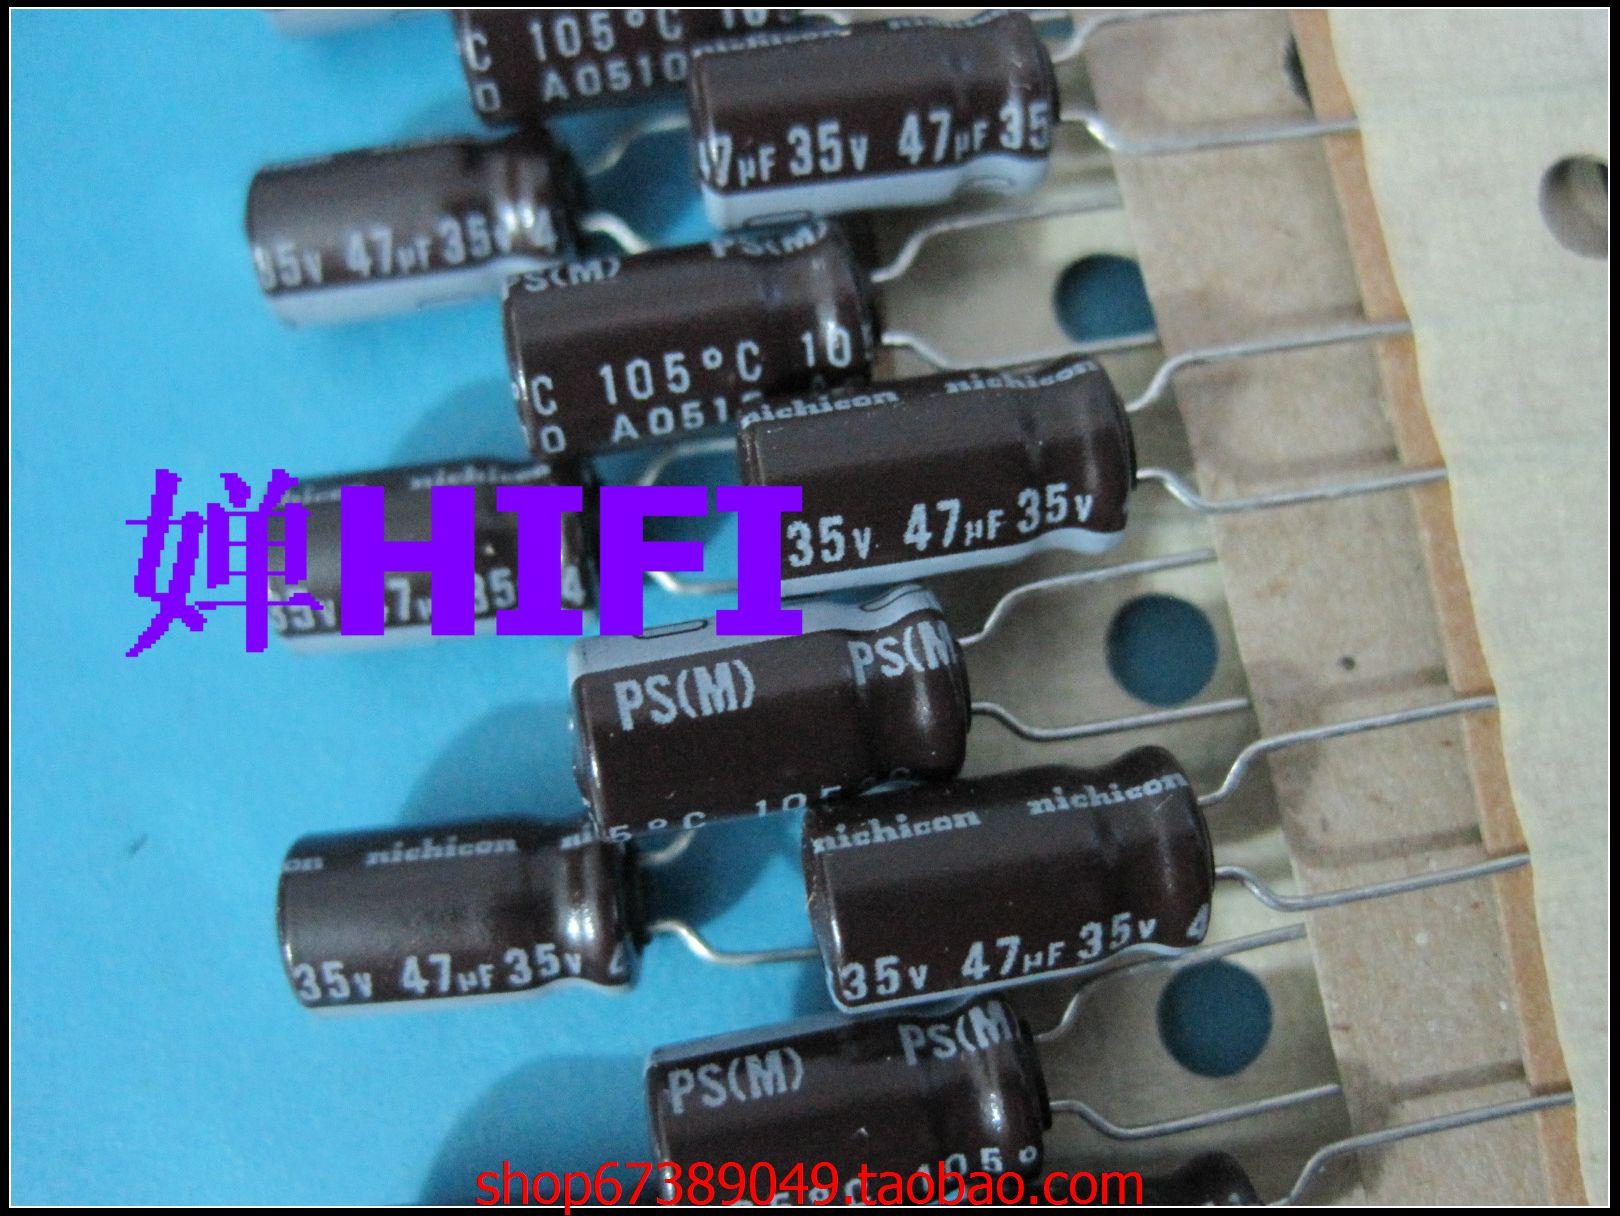 2020 hot sale 20PCS/50PCS Japan nichicon original PS electrolytic capacitor 35v47uf 6x11 free shipping 2020 hot sale holland bc 20pcs 50pcs 82pf 100v 2